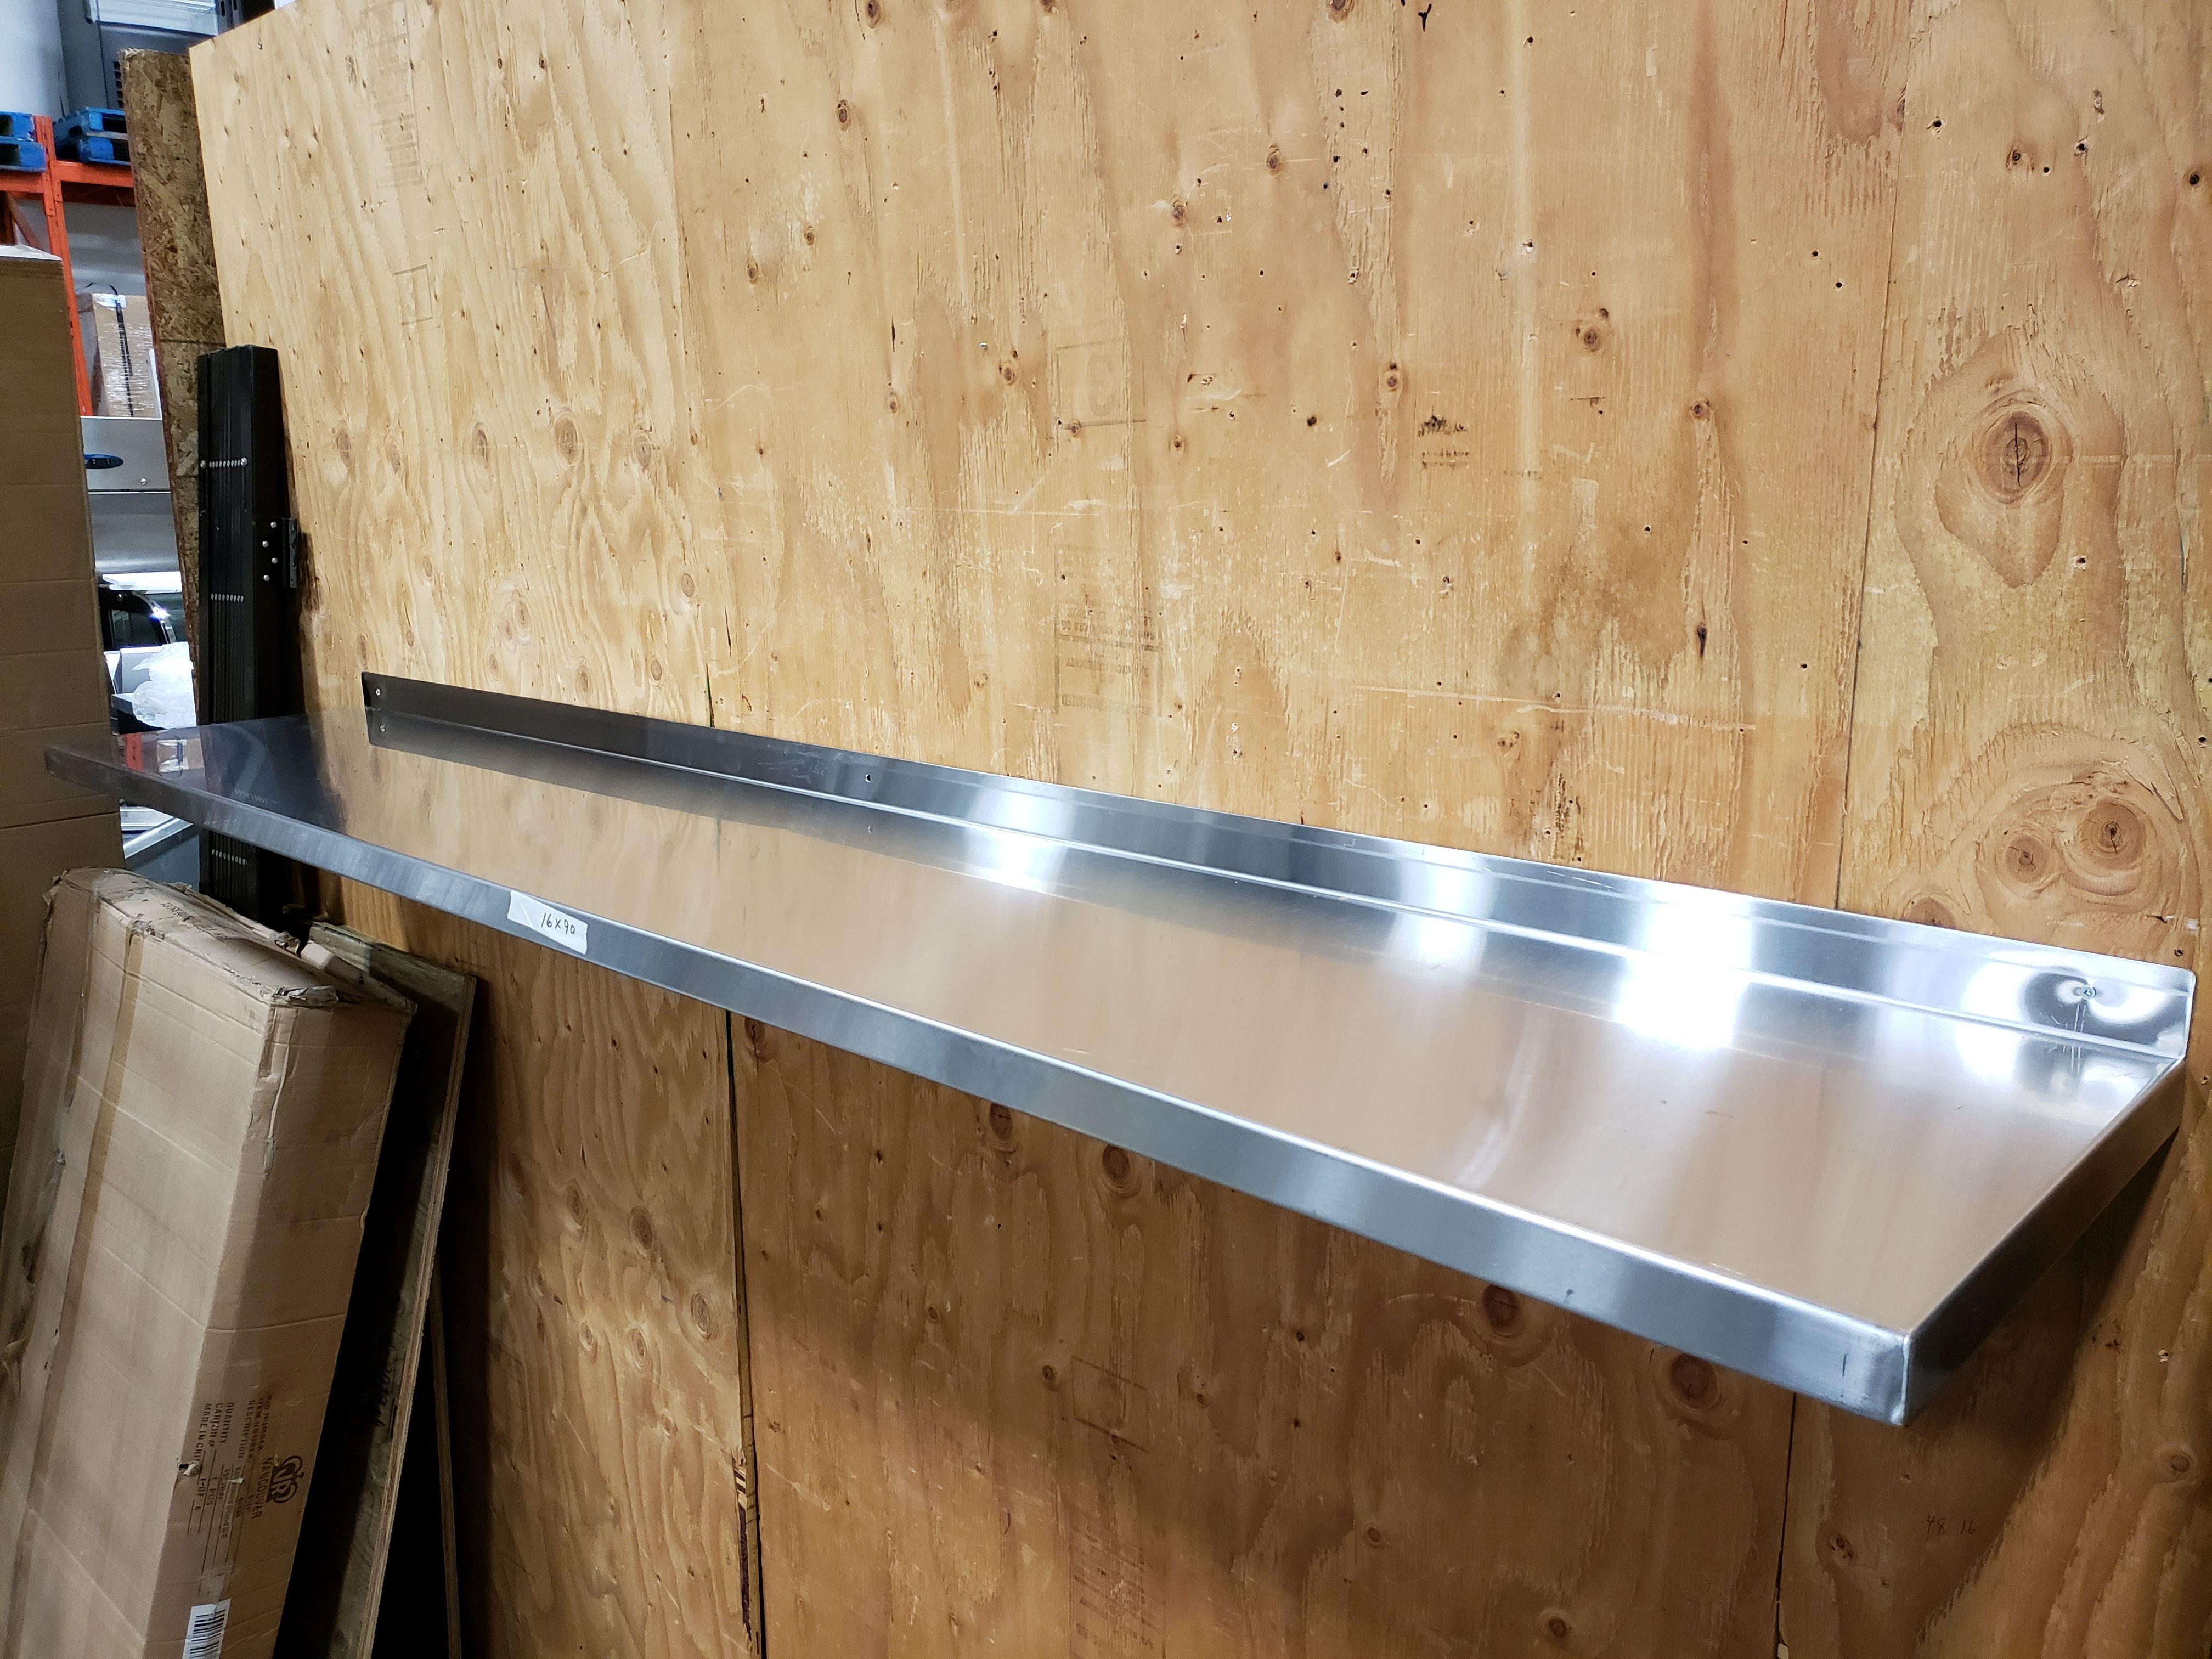 "Lot 28 - 16"" x 90"" Stainless Steel Wall Shelf"